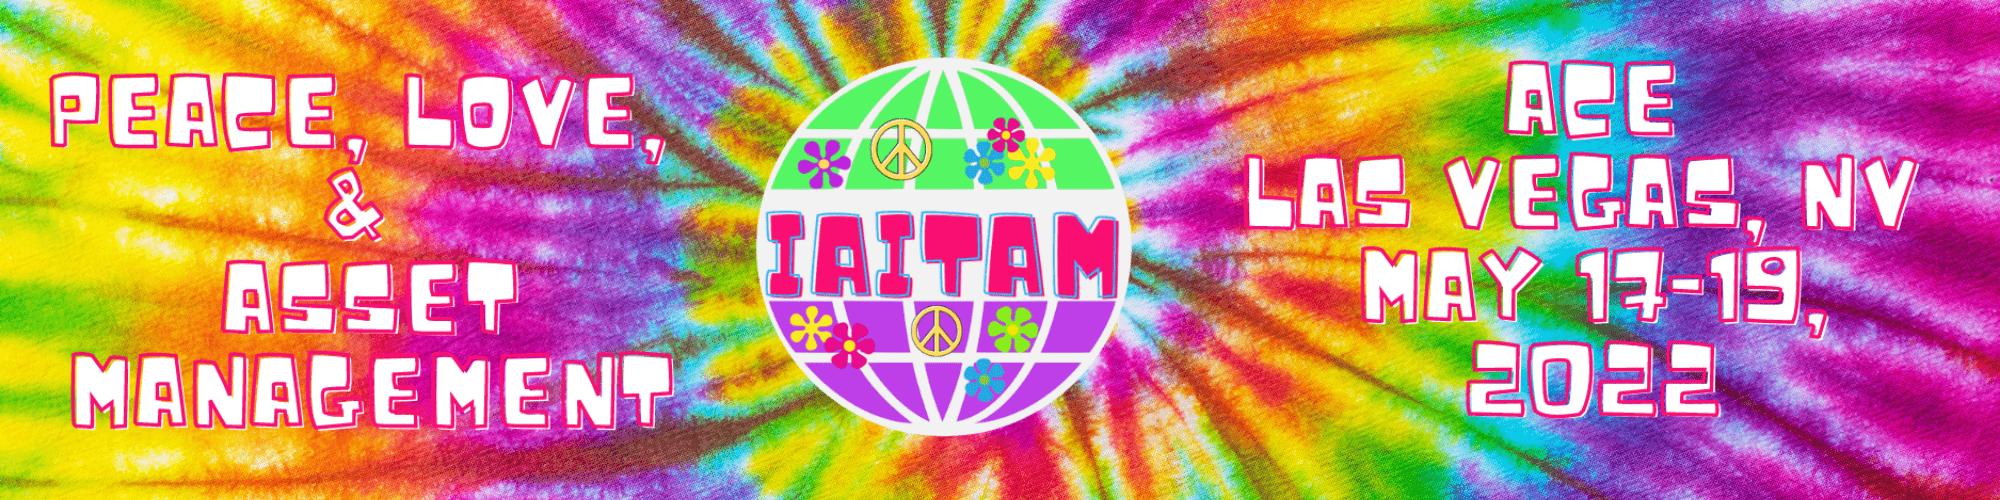 https://ace.iaitam.org